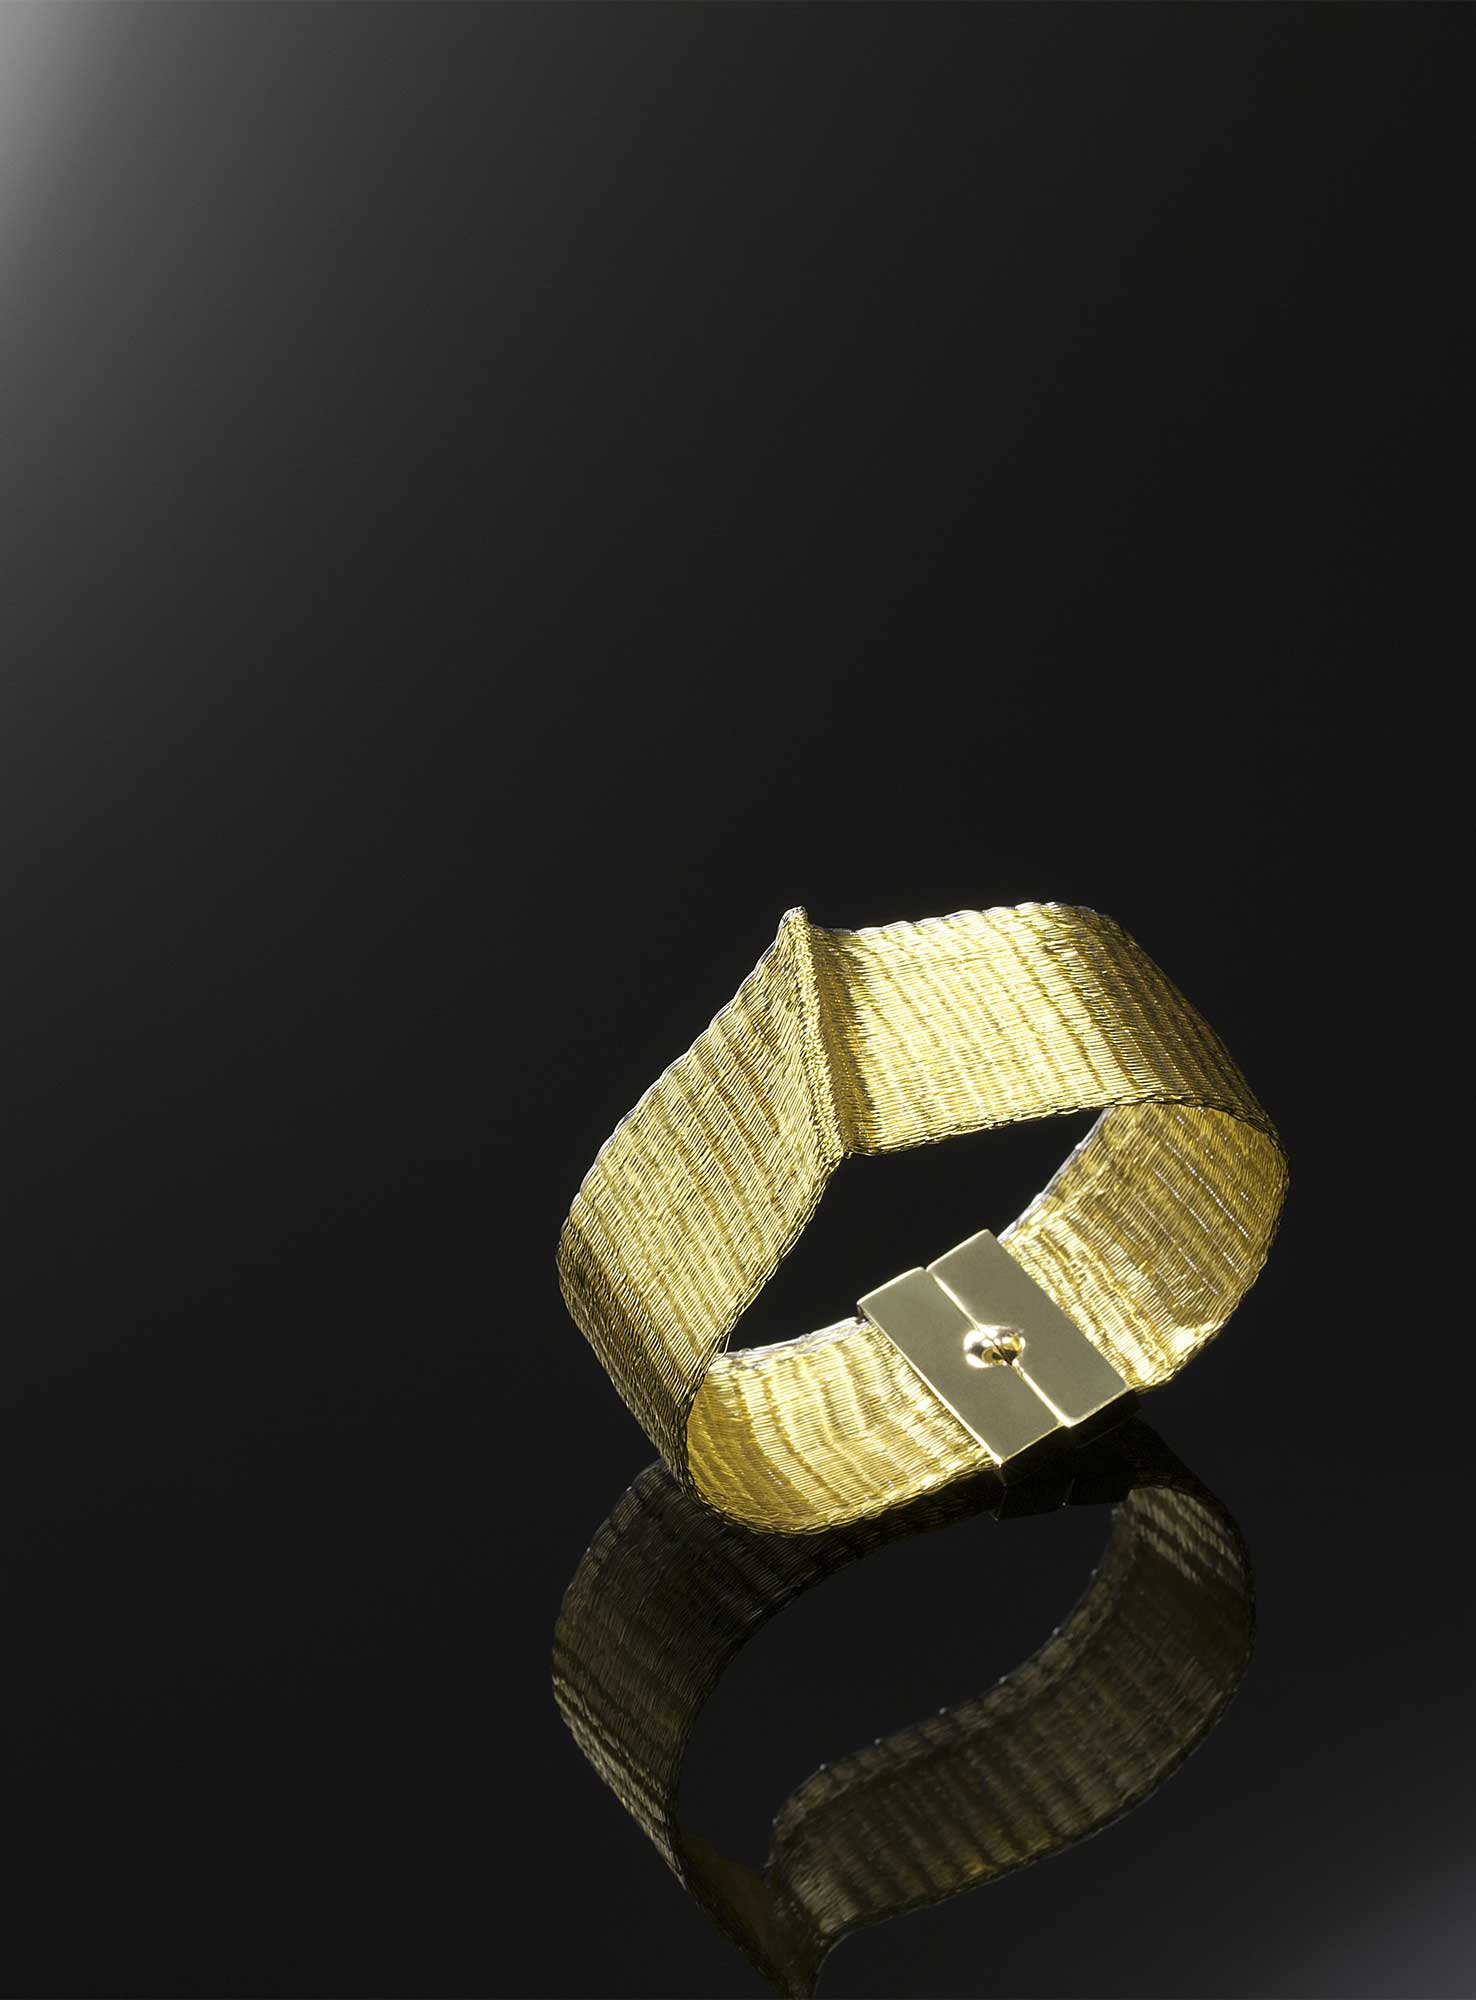 bracelet (2021)